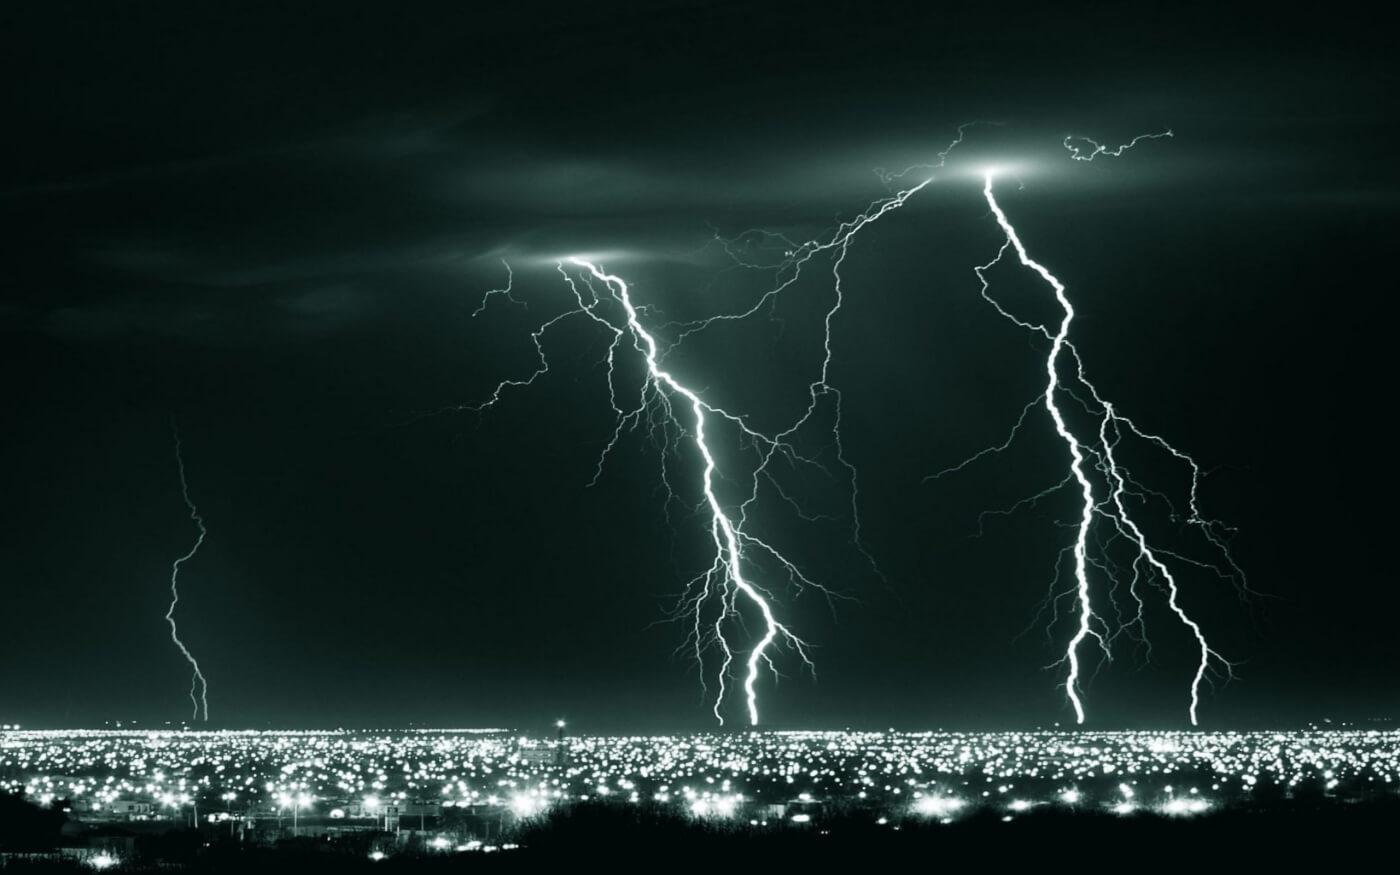 ws_night_lightning__city_2560x1600